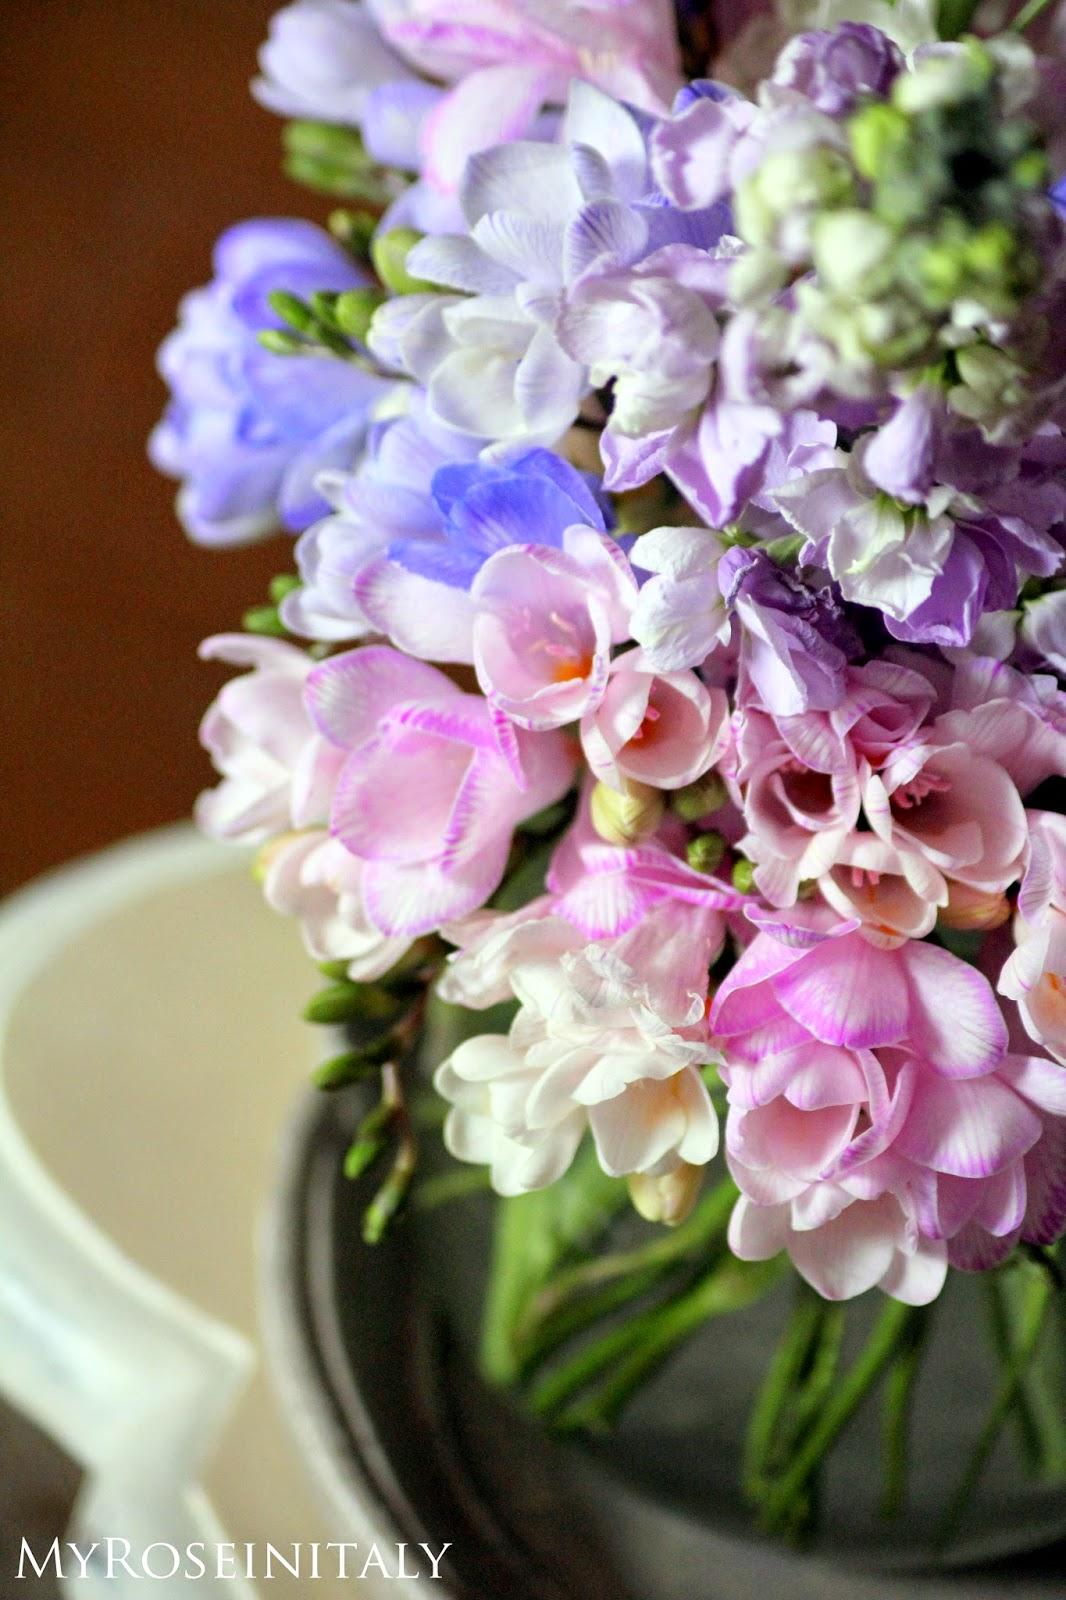 Immagini fiori primaverili - Fiori primaverili ...